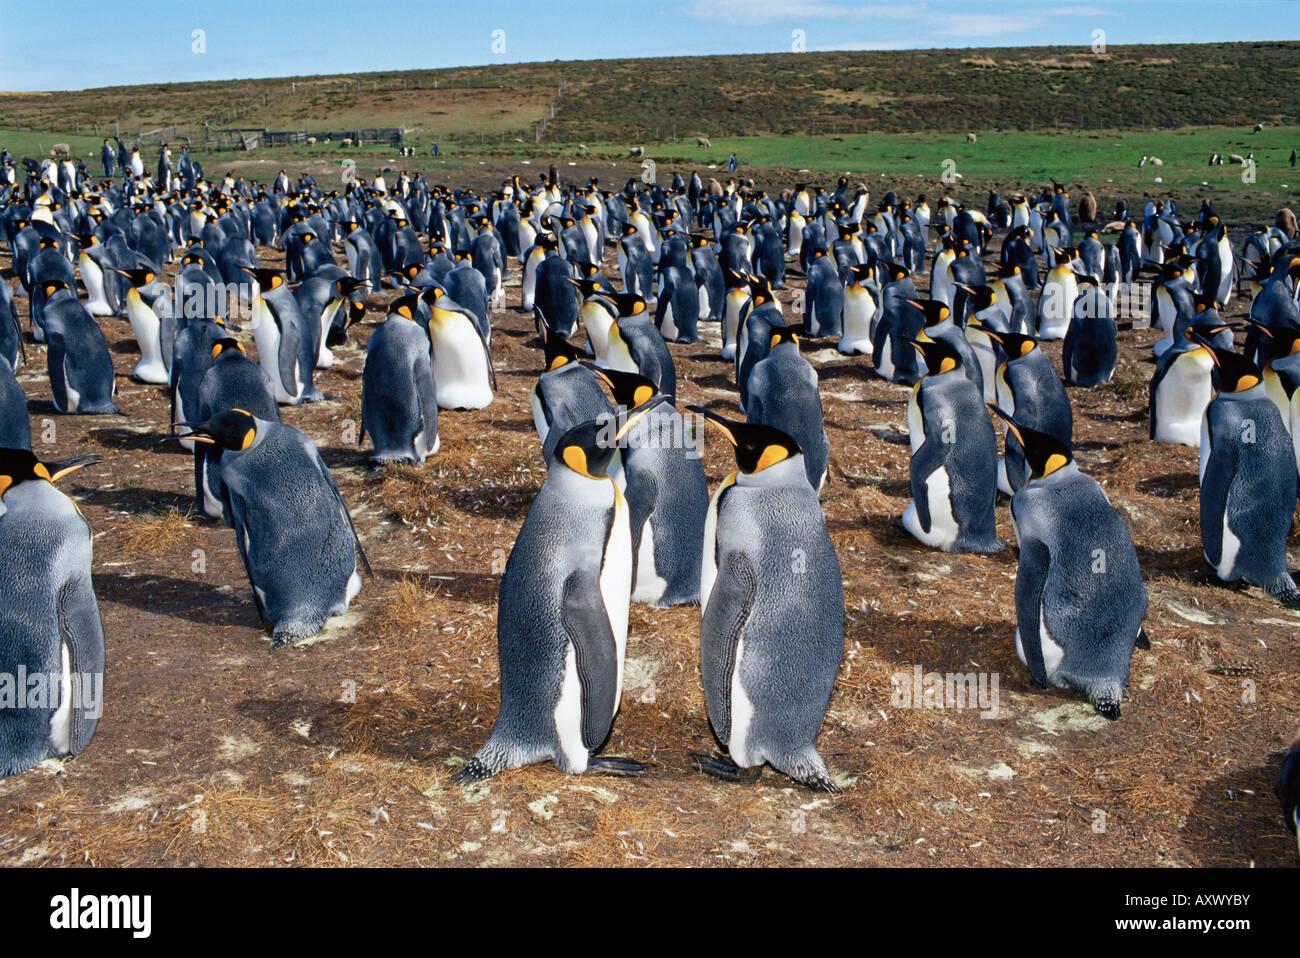 Colony of king penguins (Aptenodytes patagonicus), Volunteer Point, East Falkland, Falkland Islands, South Atlantic - Stock Image